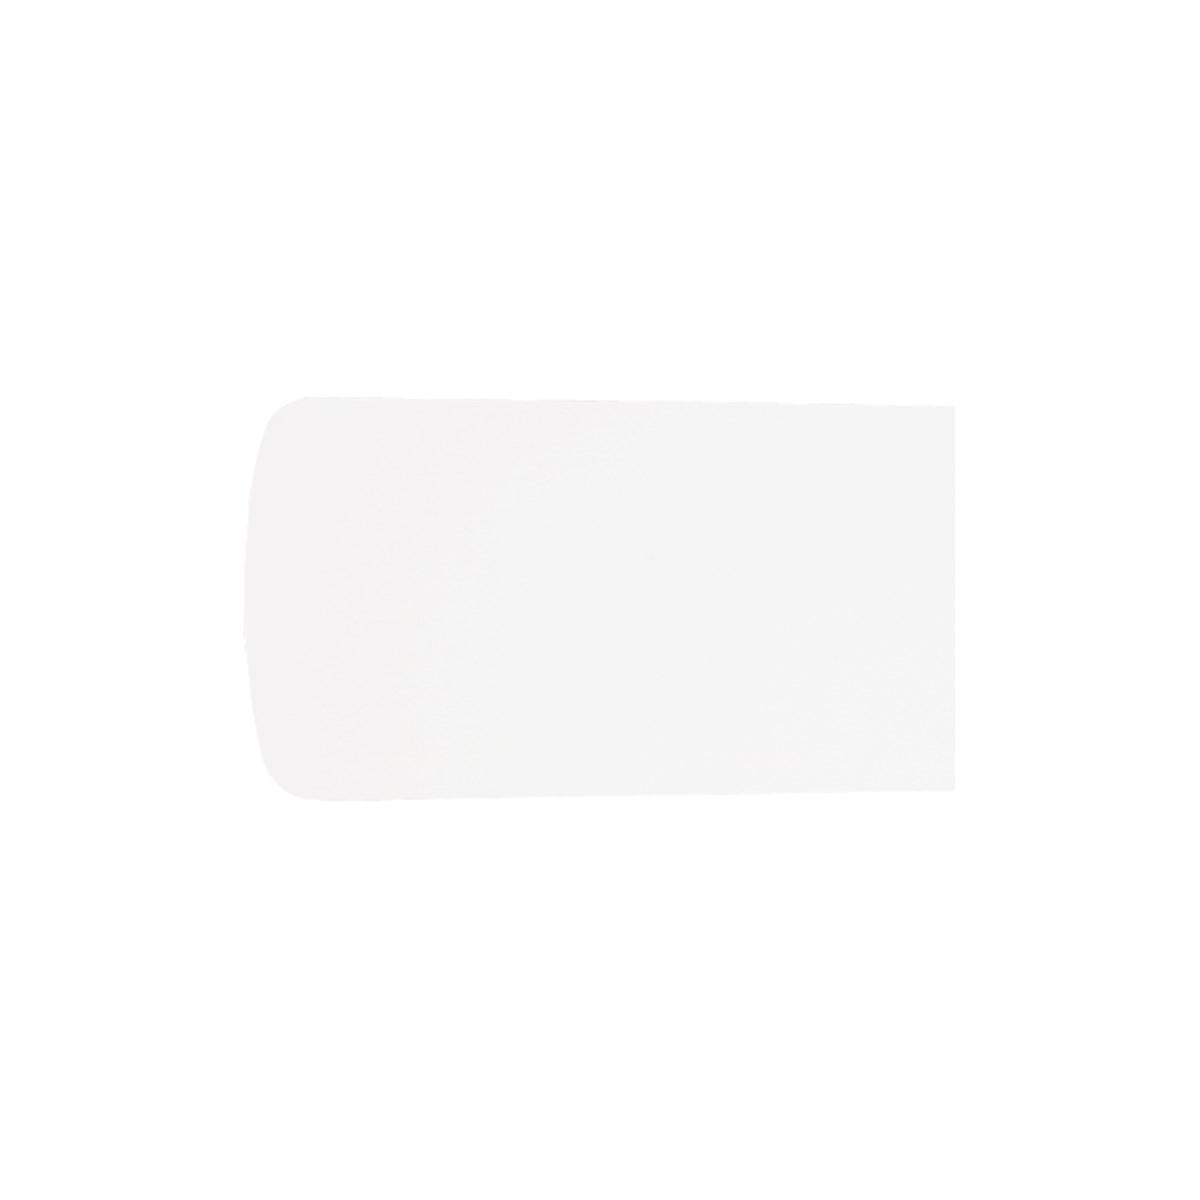 WHITE TYPE 1-30 SEMISQ